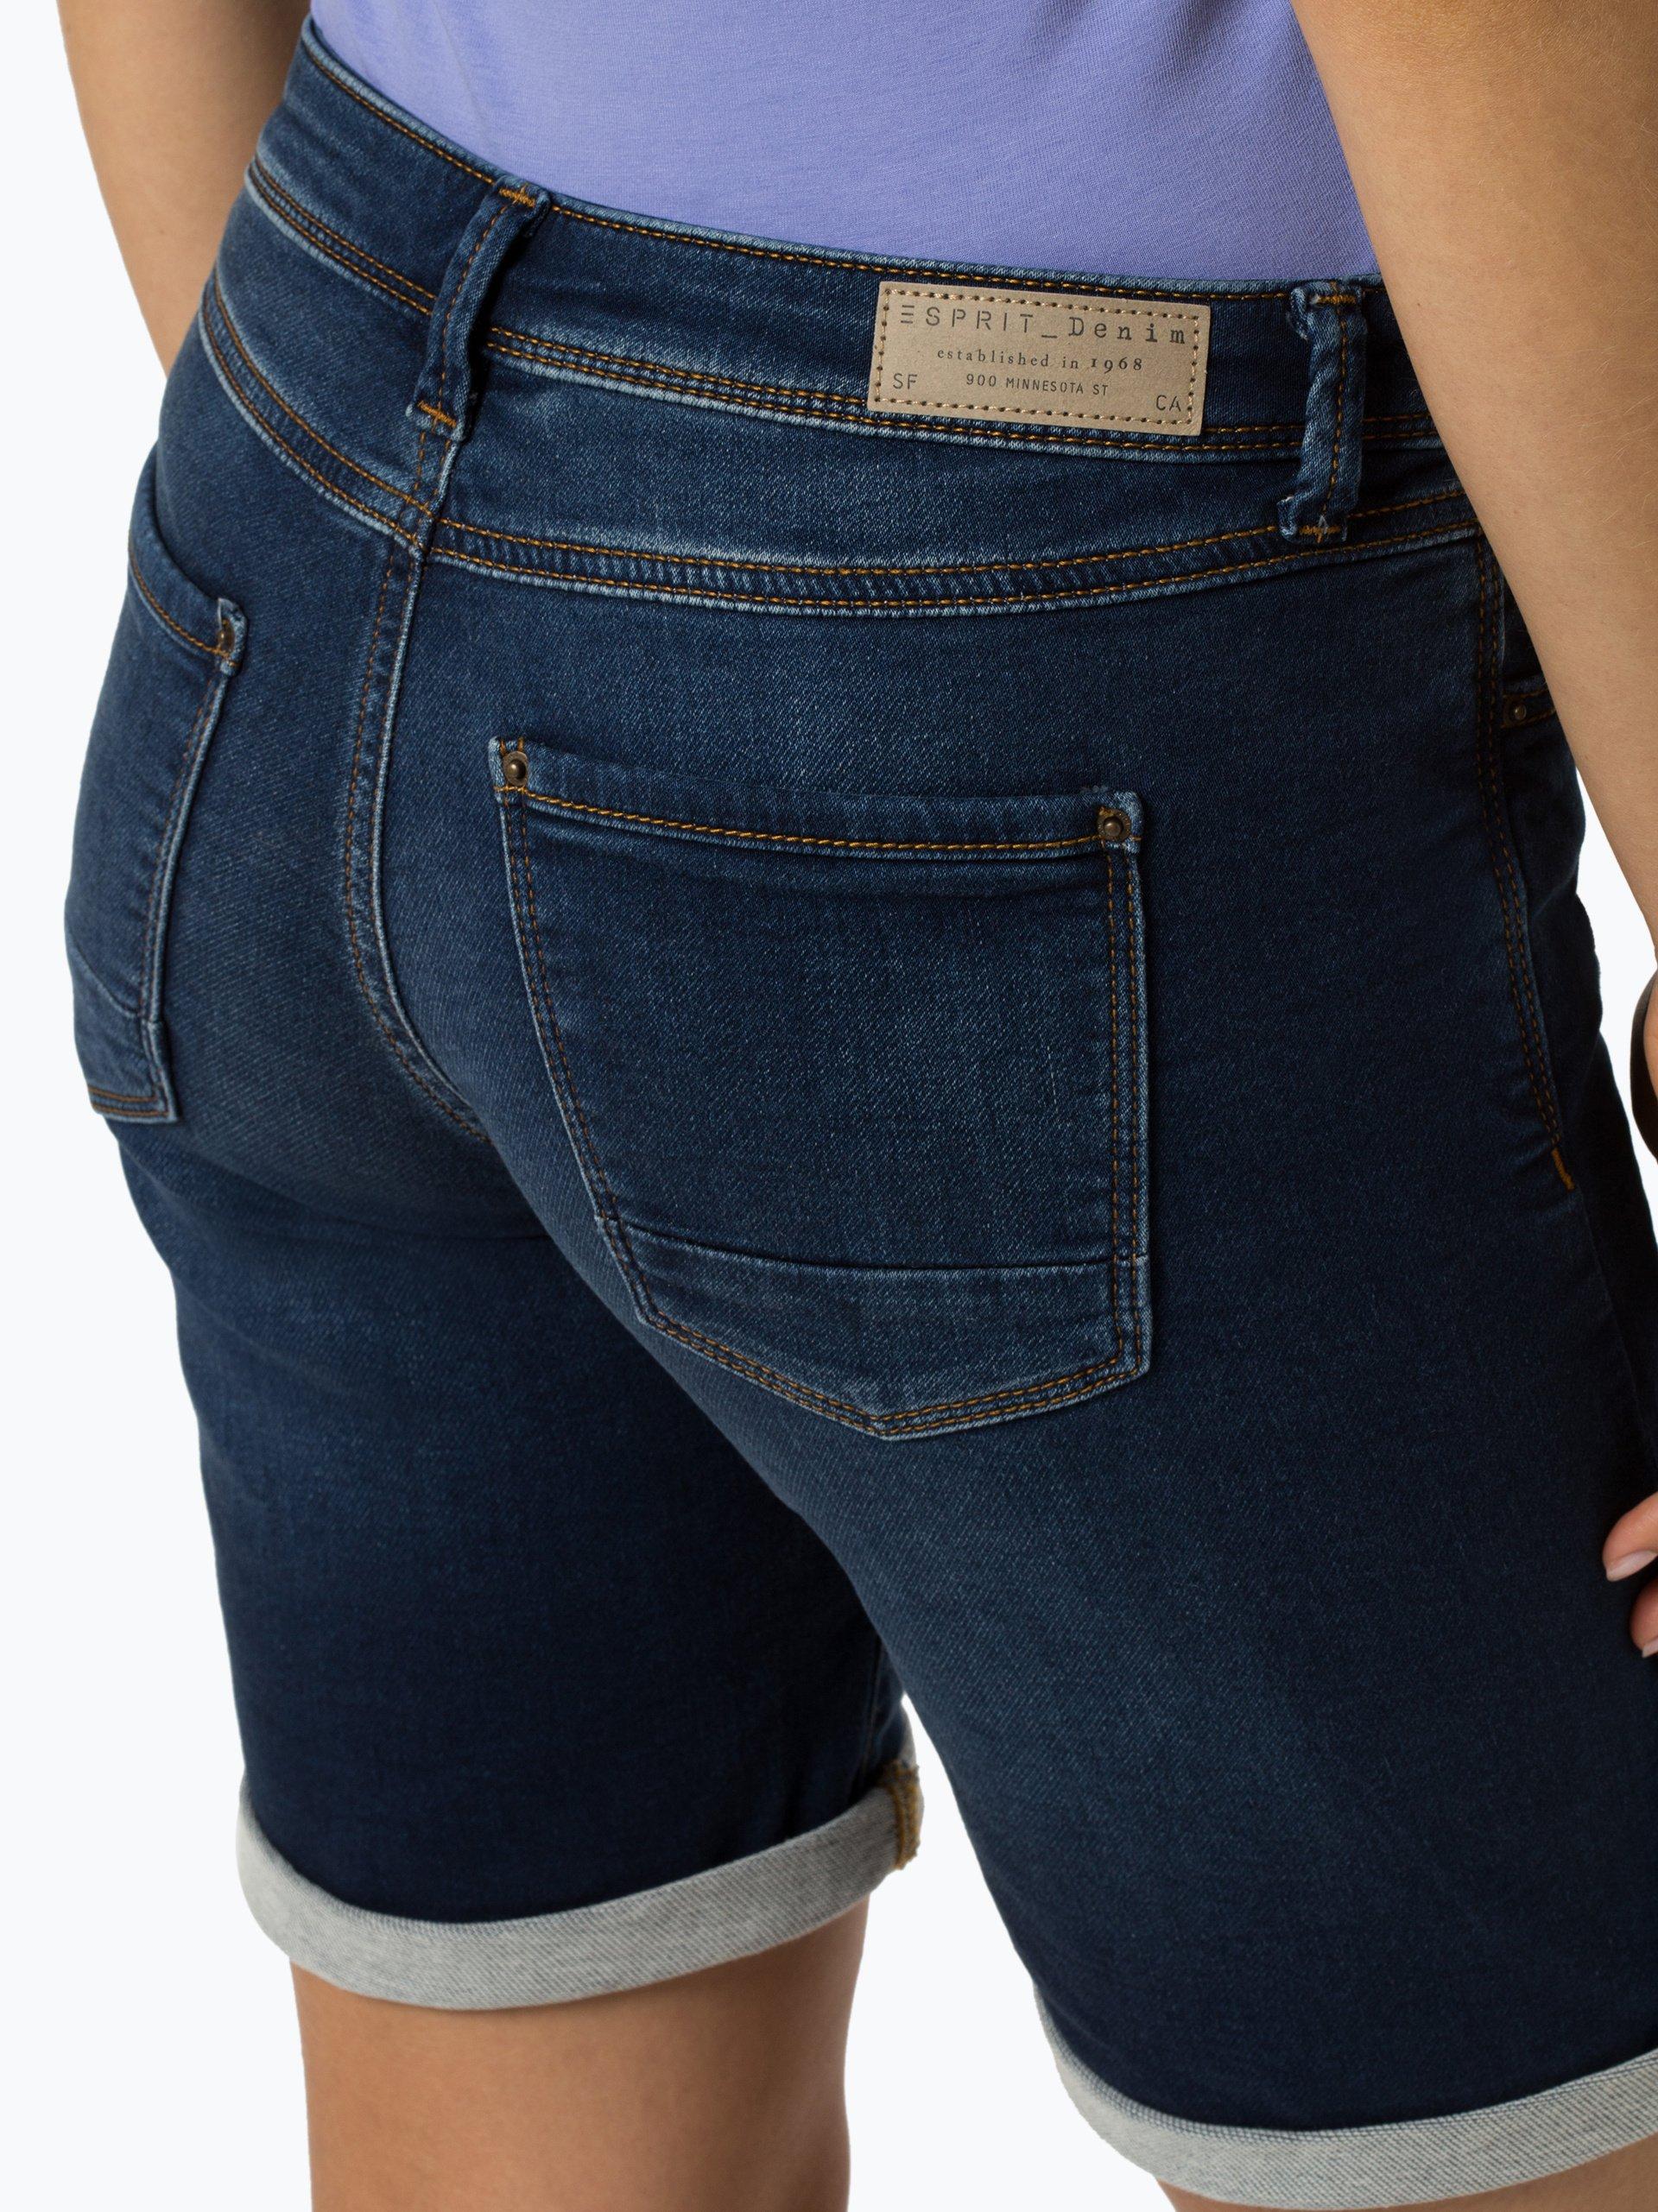 Esprit Casual Damen Jeansshorts